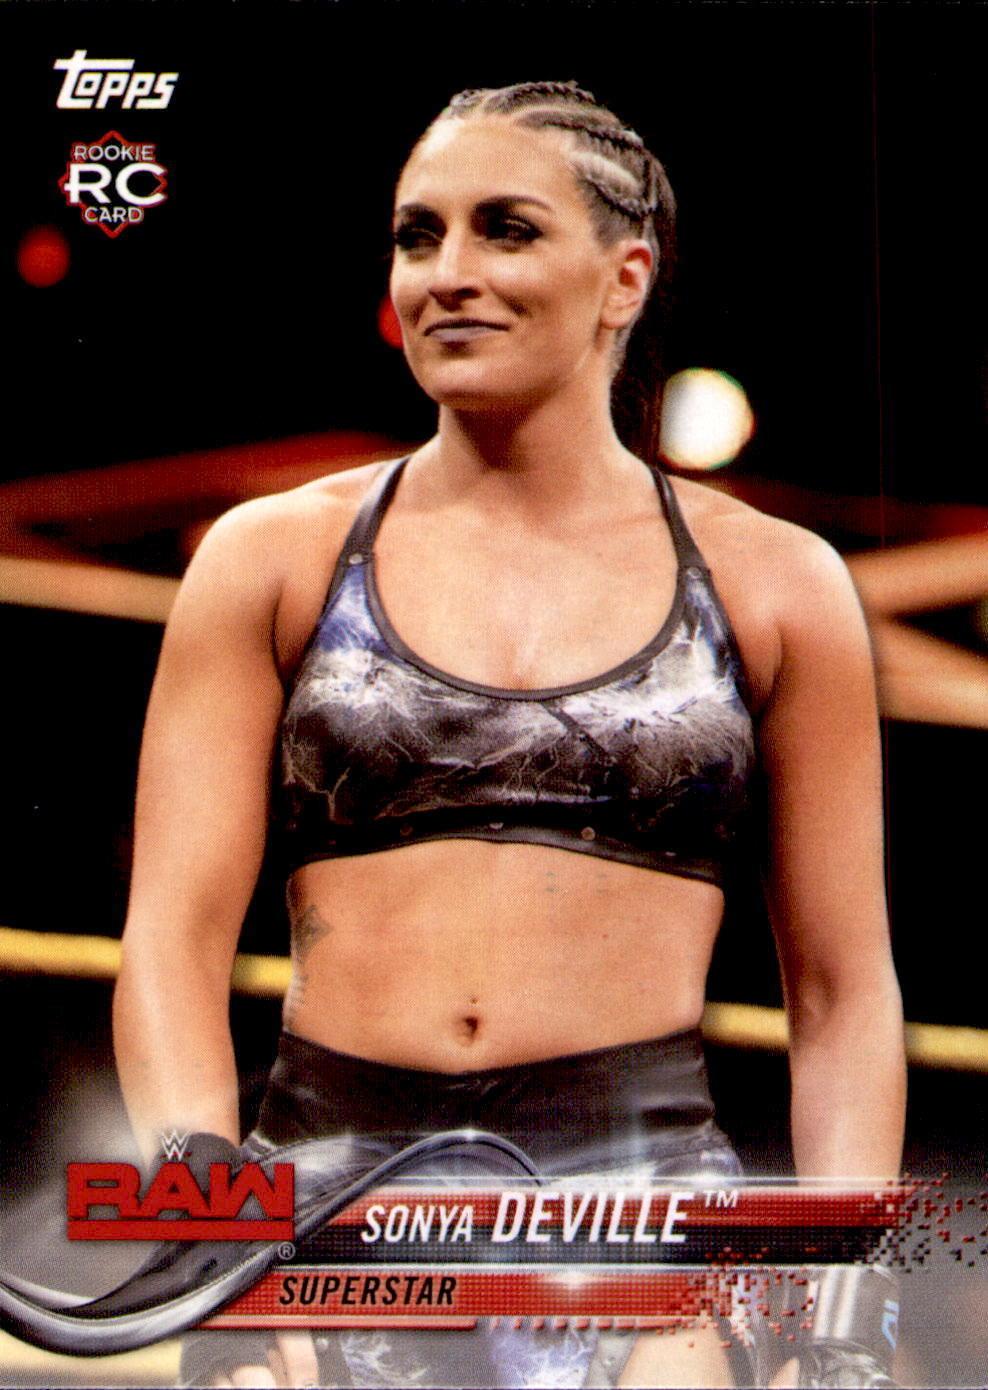 2018 WWE Wrestling Cards (Topps) Sonya Deville (No.85)